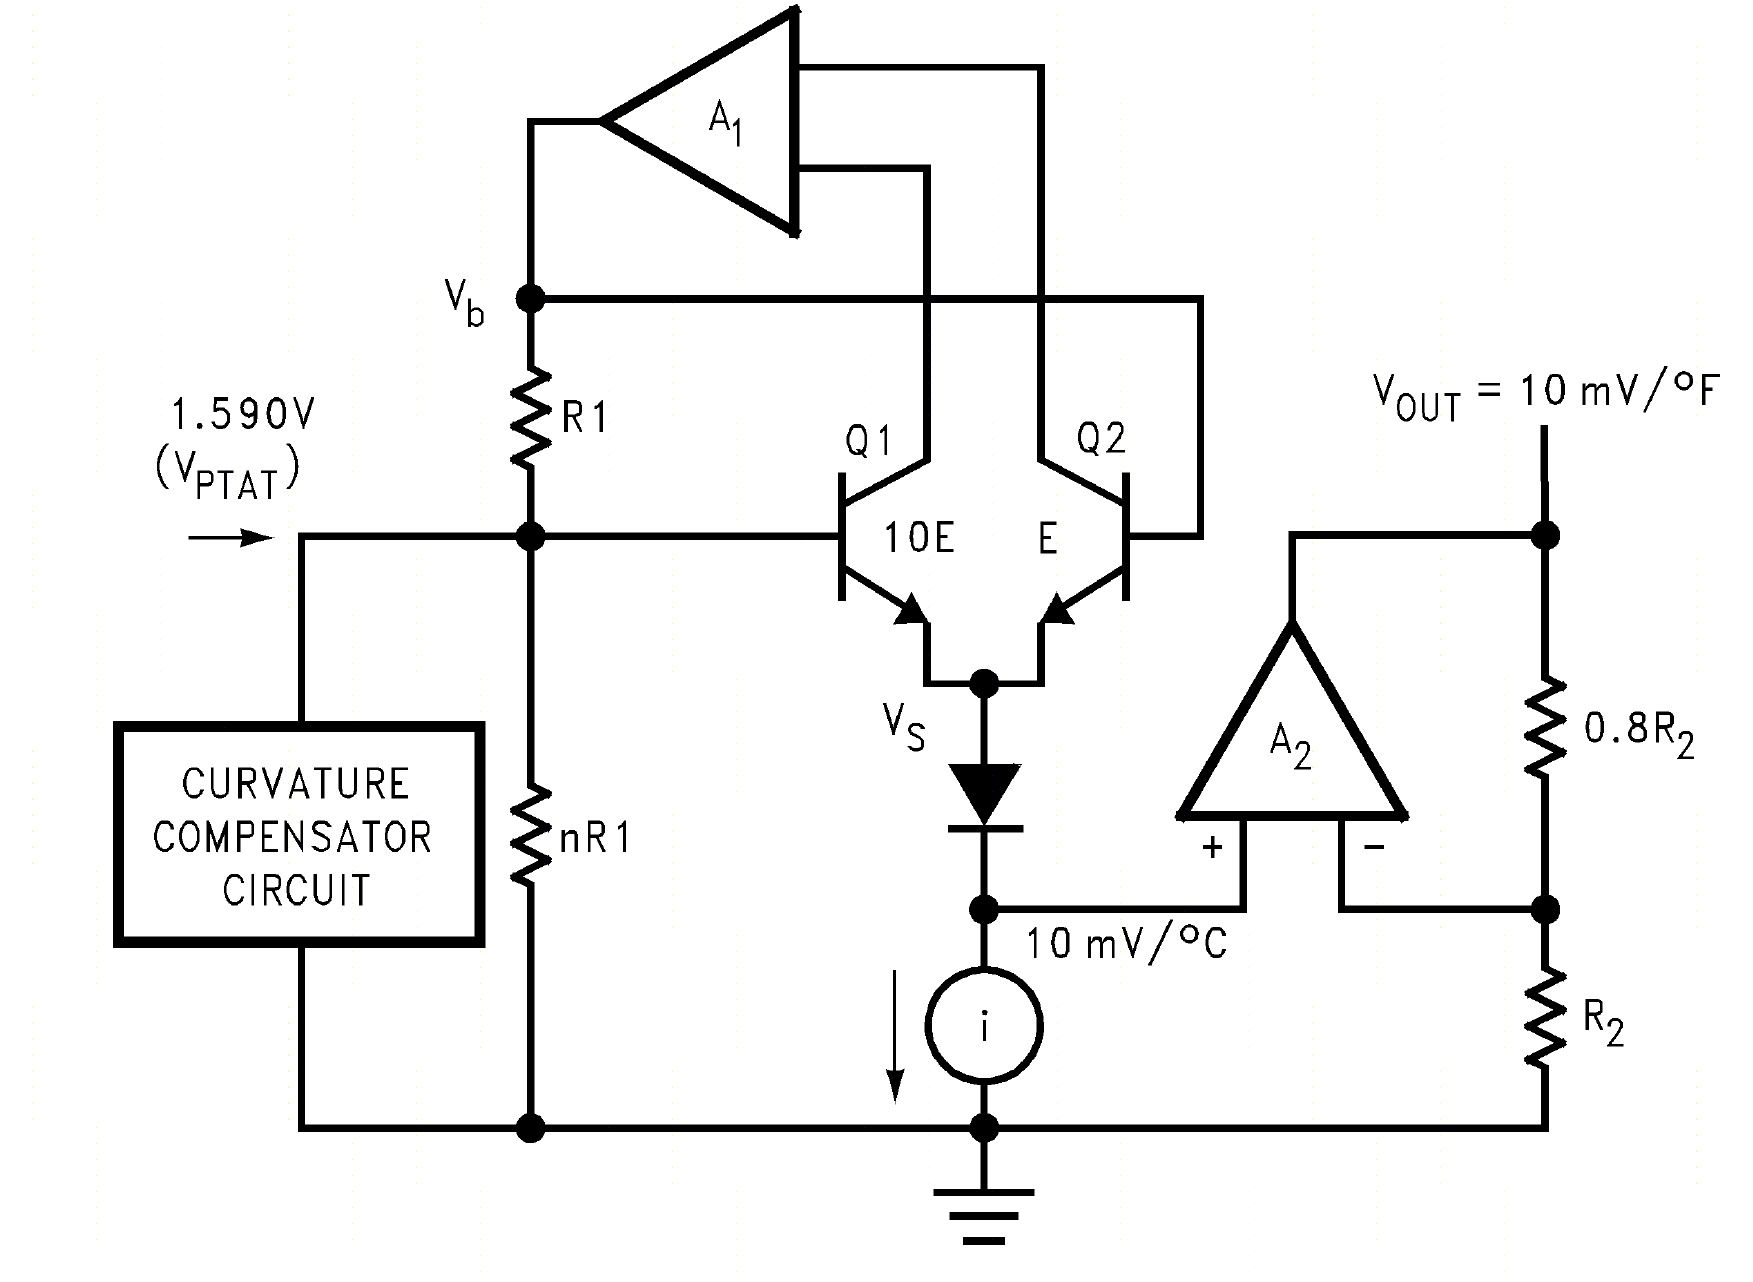 medium resolution of explanation regarding this circuit i wish to understand the schematic